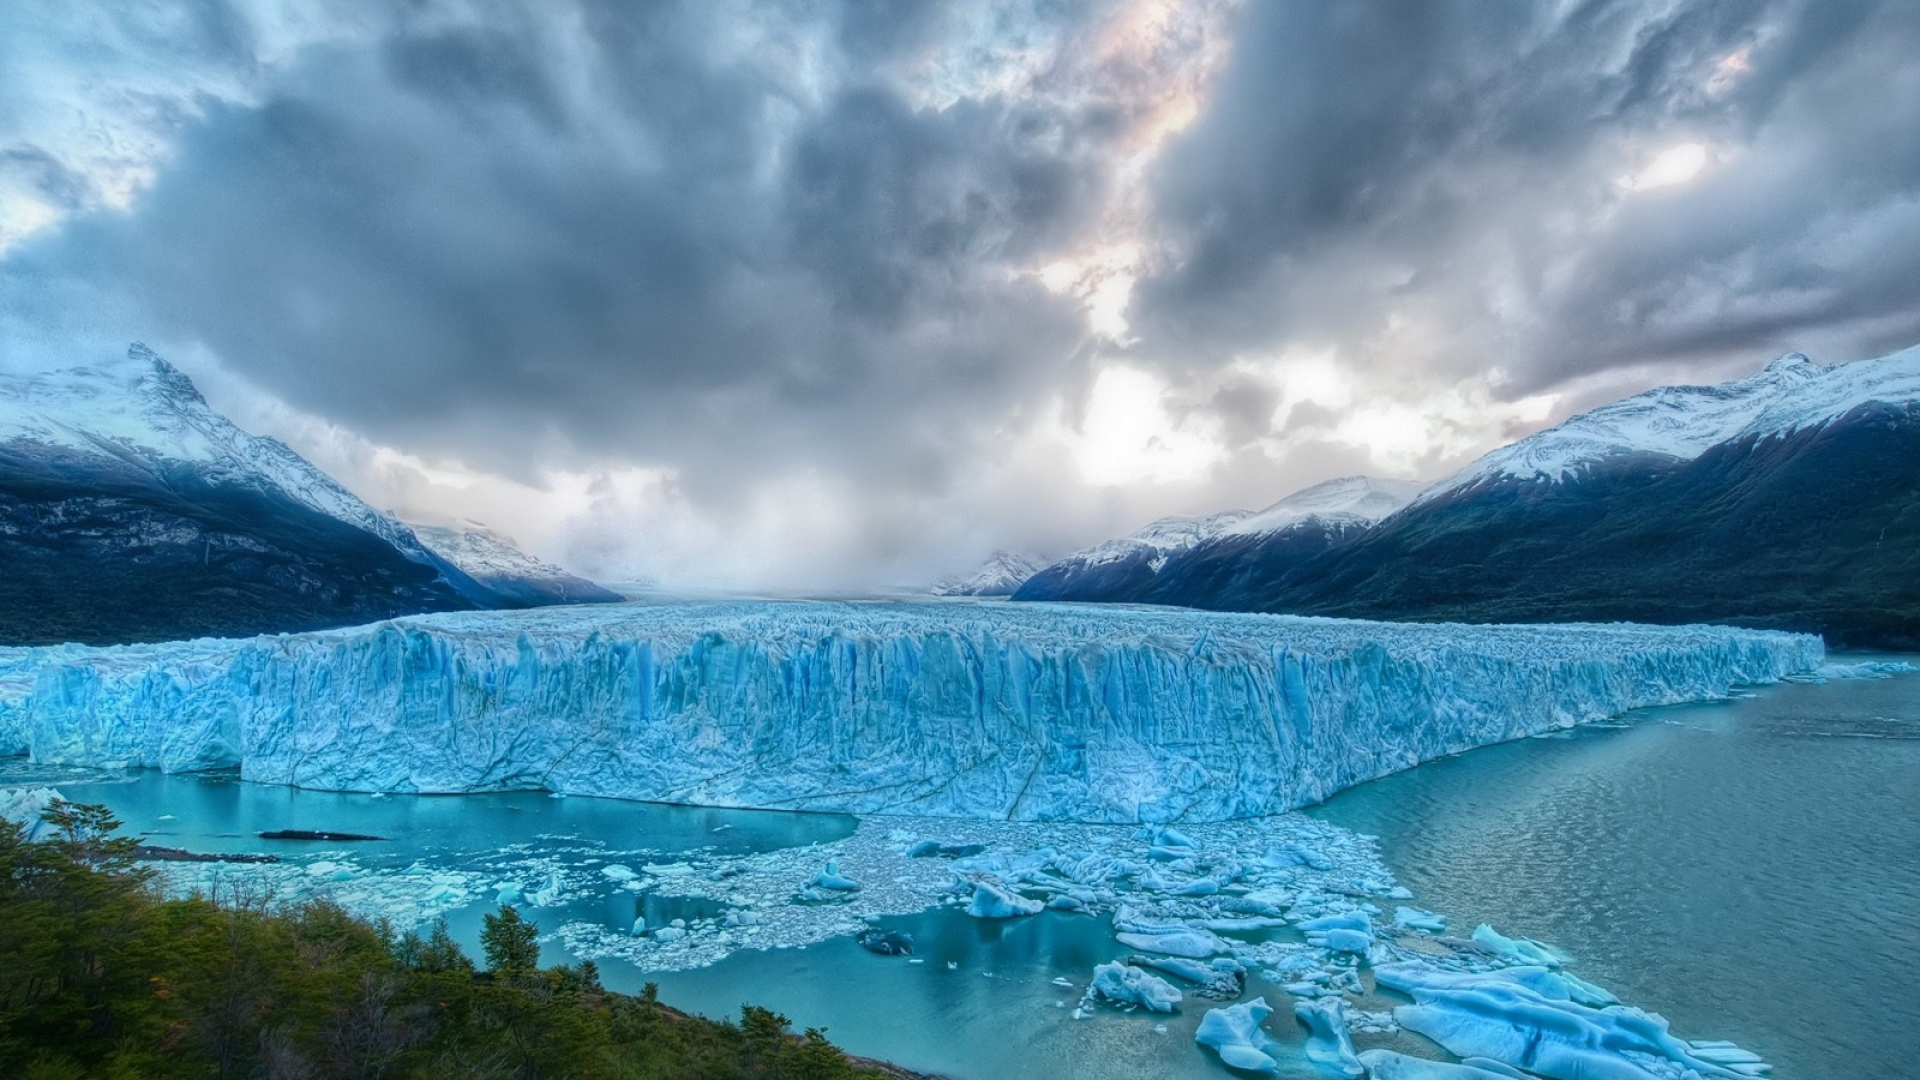 Download Wallpaper 1920x1080 glacier, sky, clouds ...